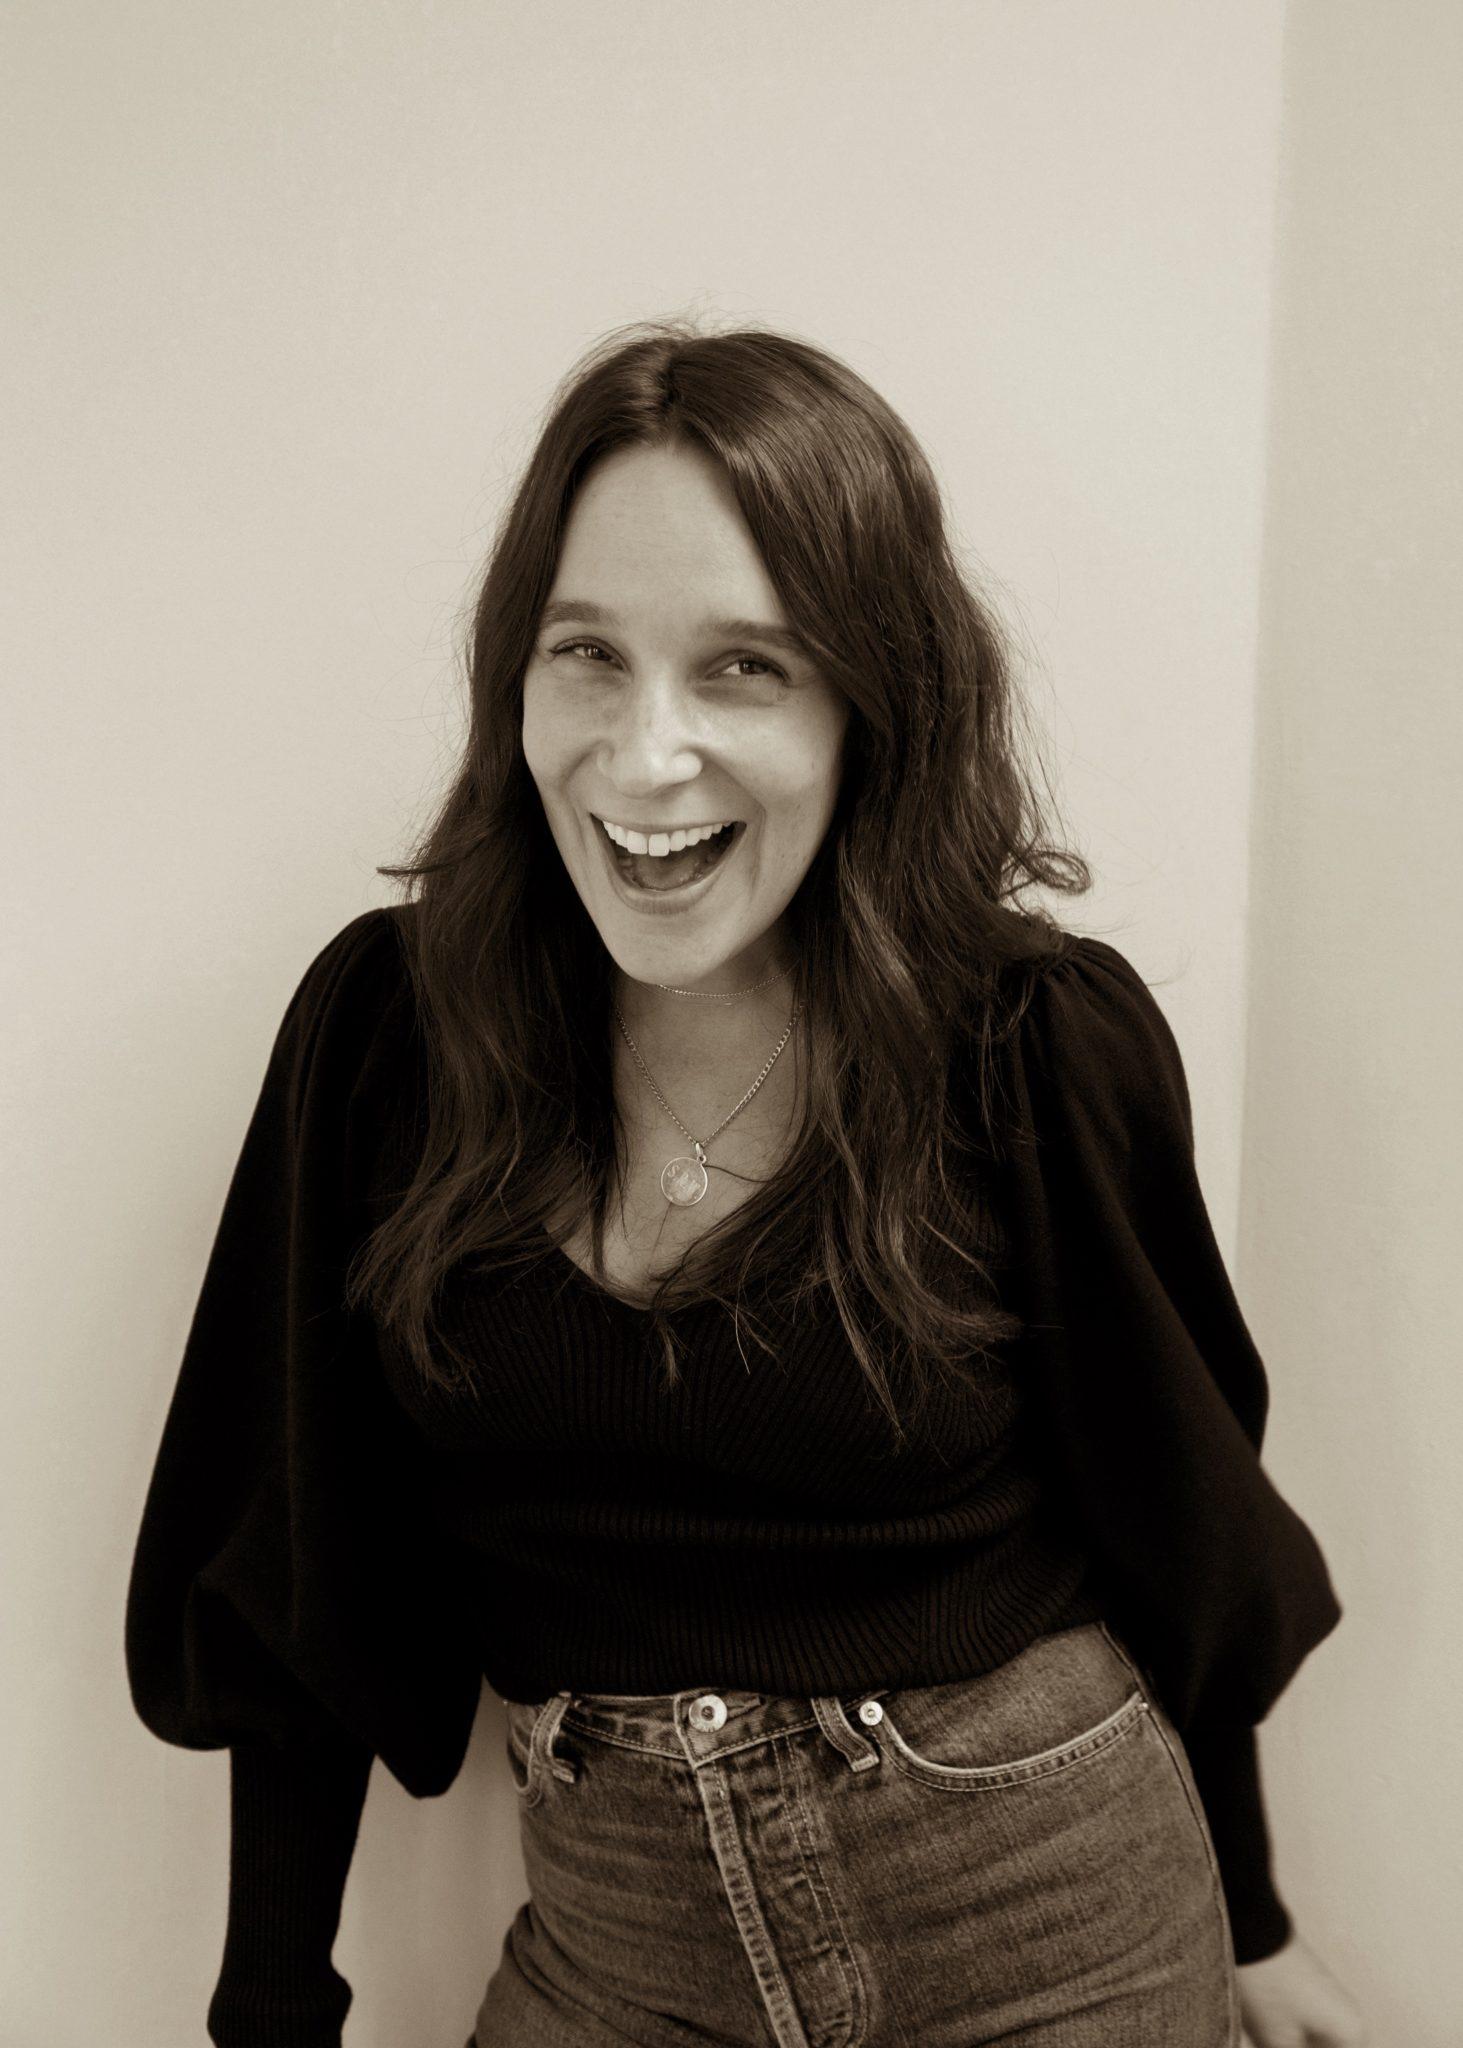 Sarah Wacks